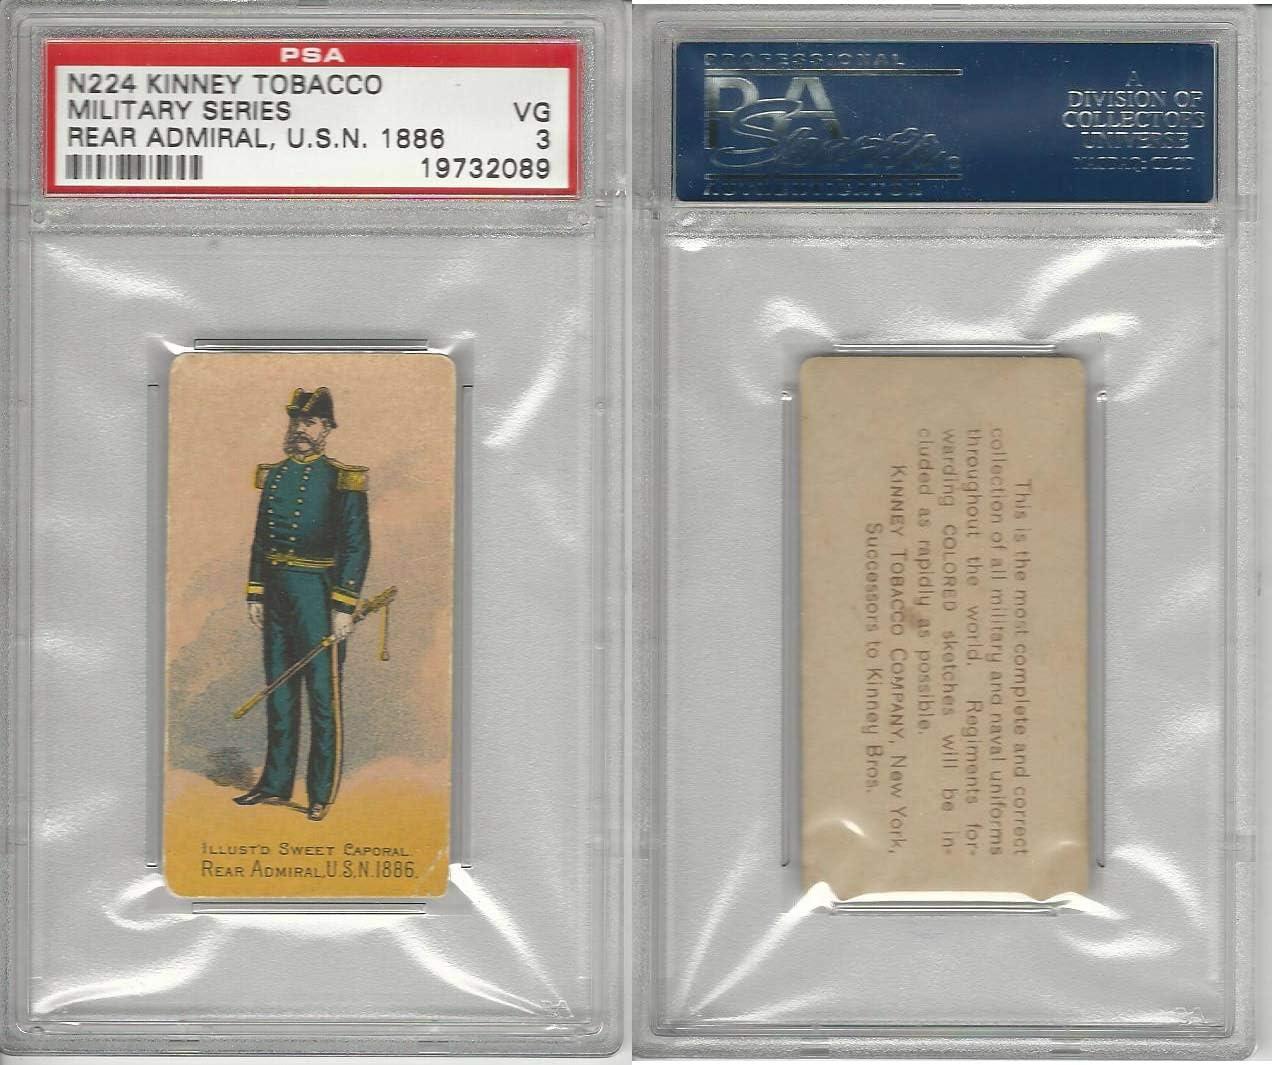 N224 Kinney 1887, Military, US Navy Types,#71 Rear Admiral, PSA 3 VG